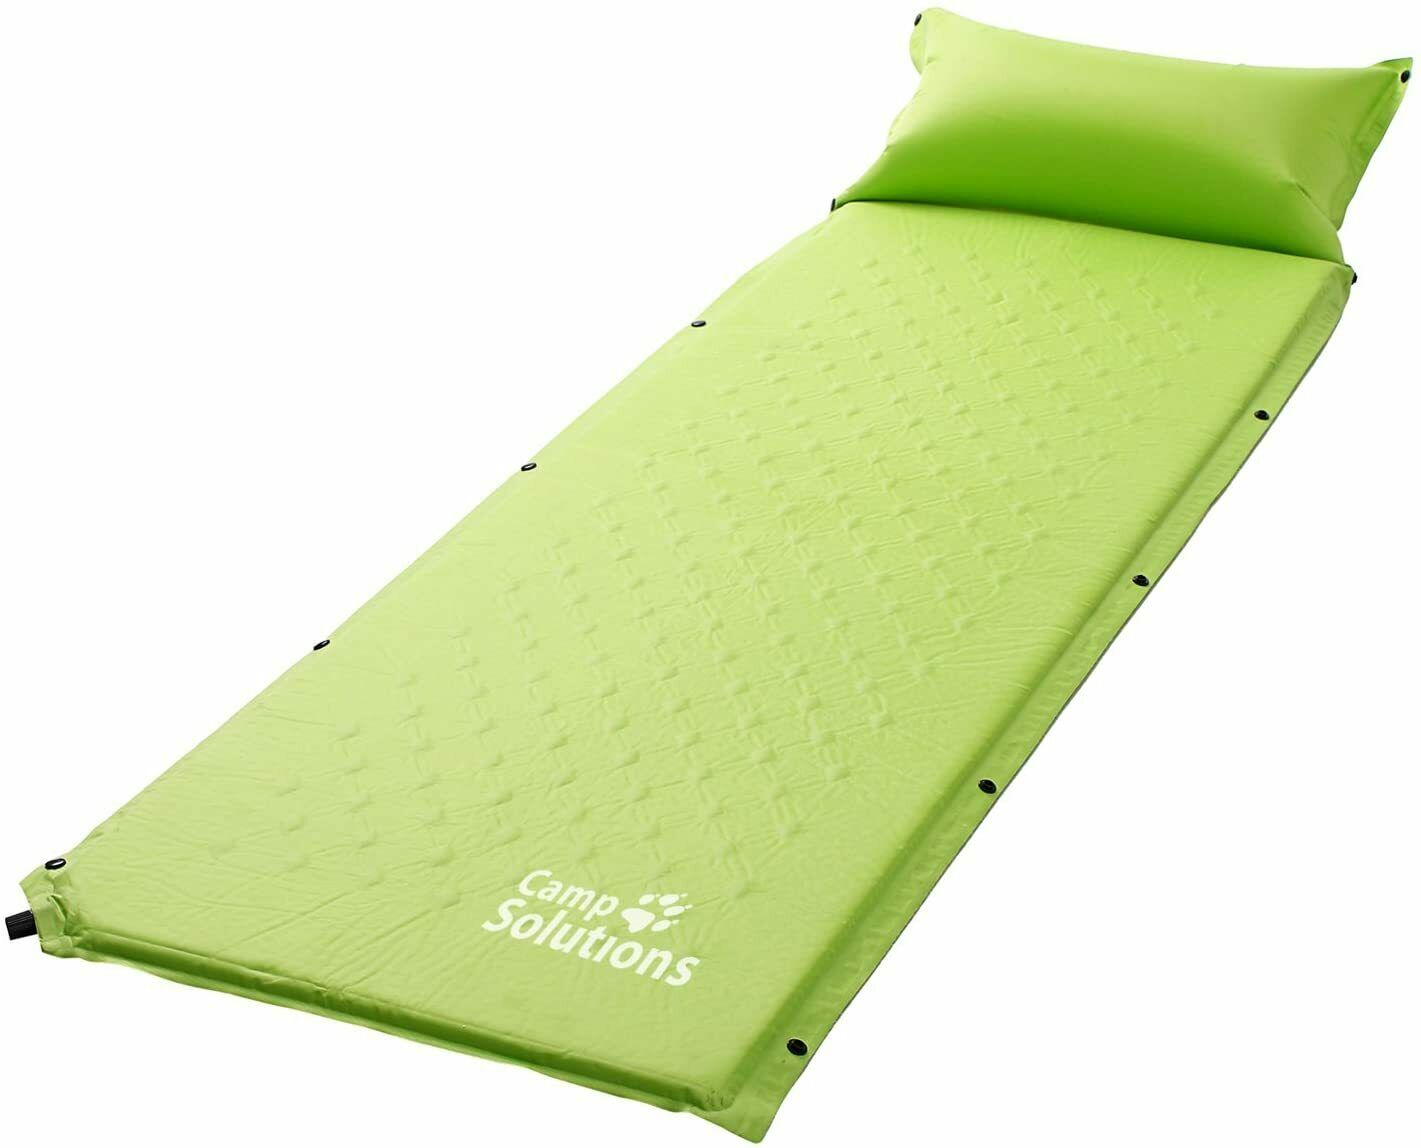 Seatopia Self Inflating Sleeping Pad Lightweight Foam Paddin